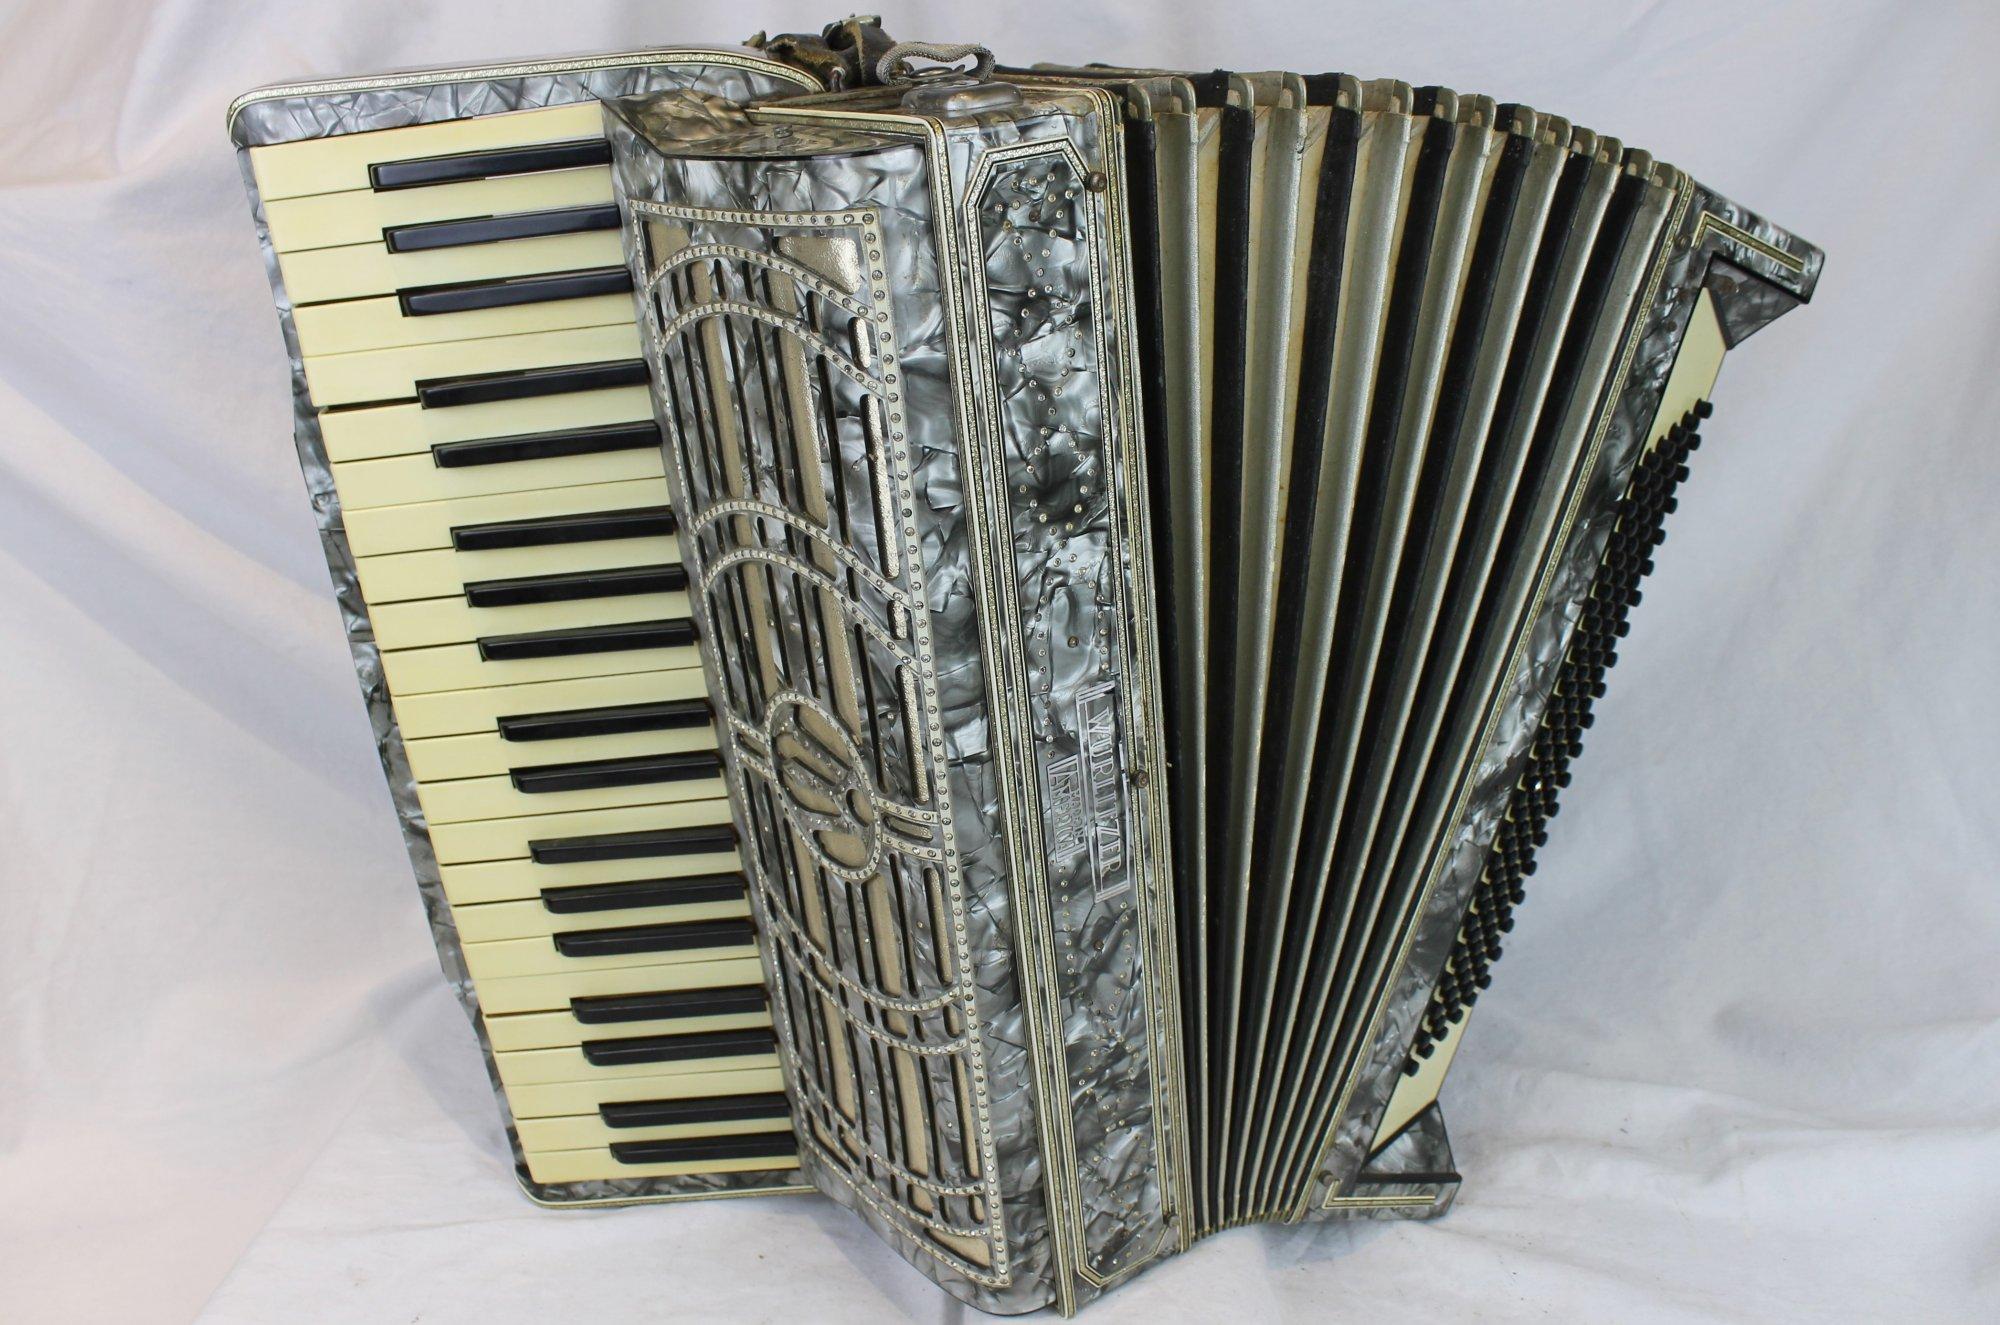 6129 - Silver Wurlitzer Piano Accordion LMM 41 120 - For Parts or Repair